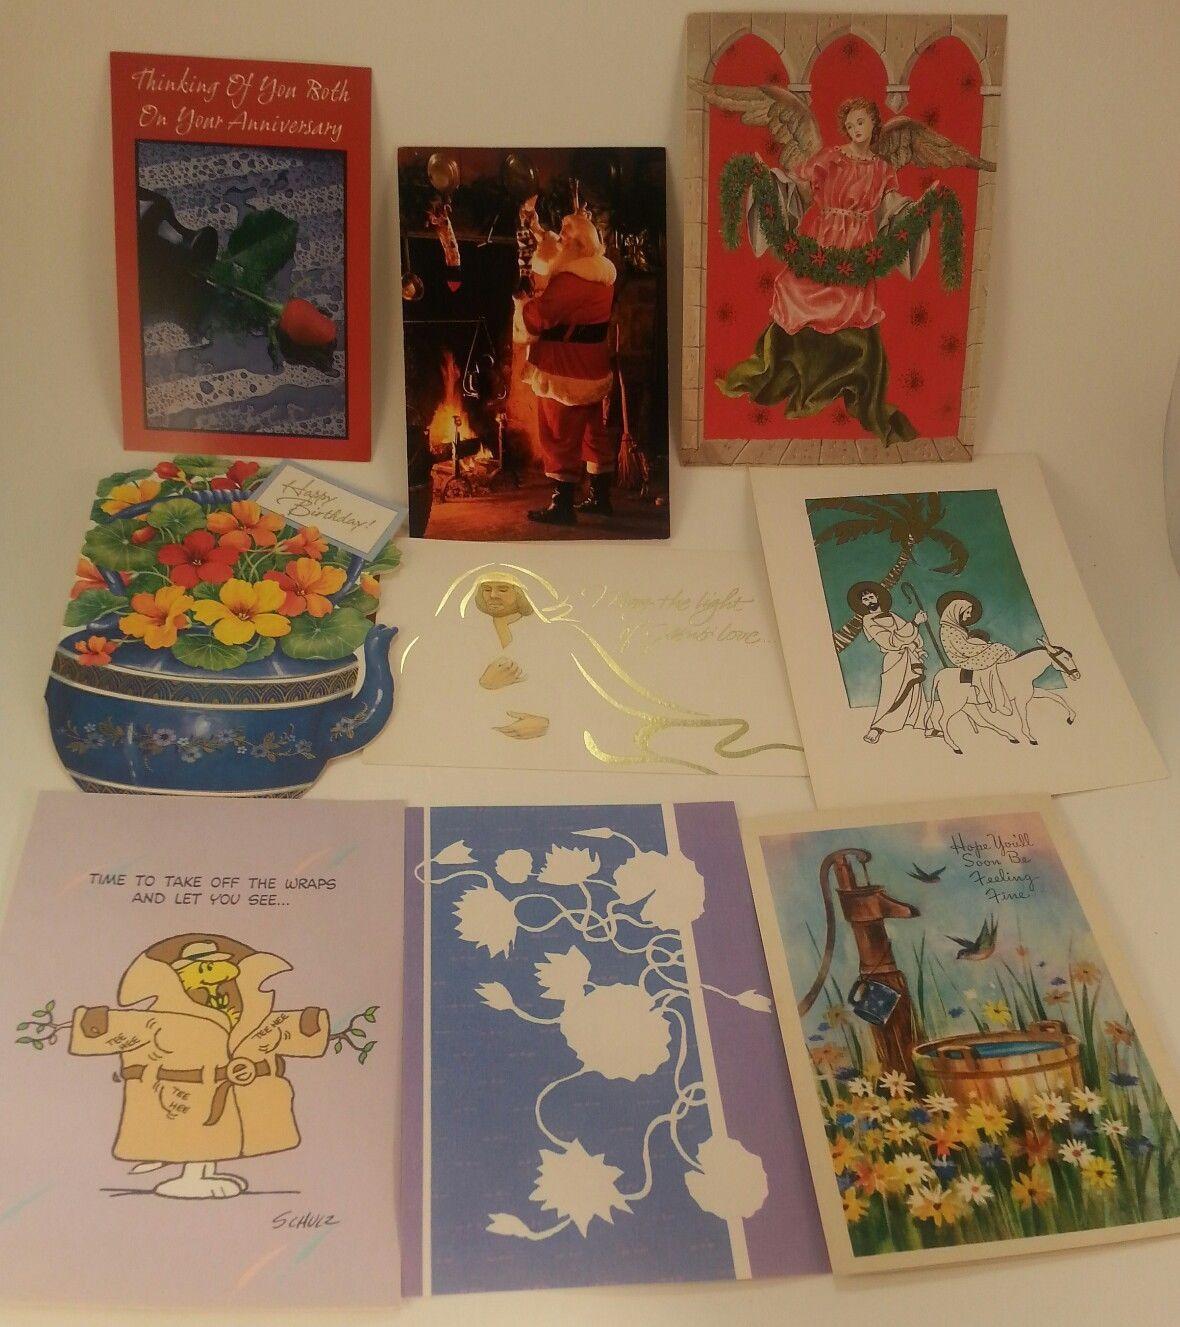 250 Used Greetings Cards Crafts Scrapbooking Hallmark American Greetings  1980s